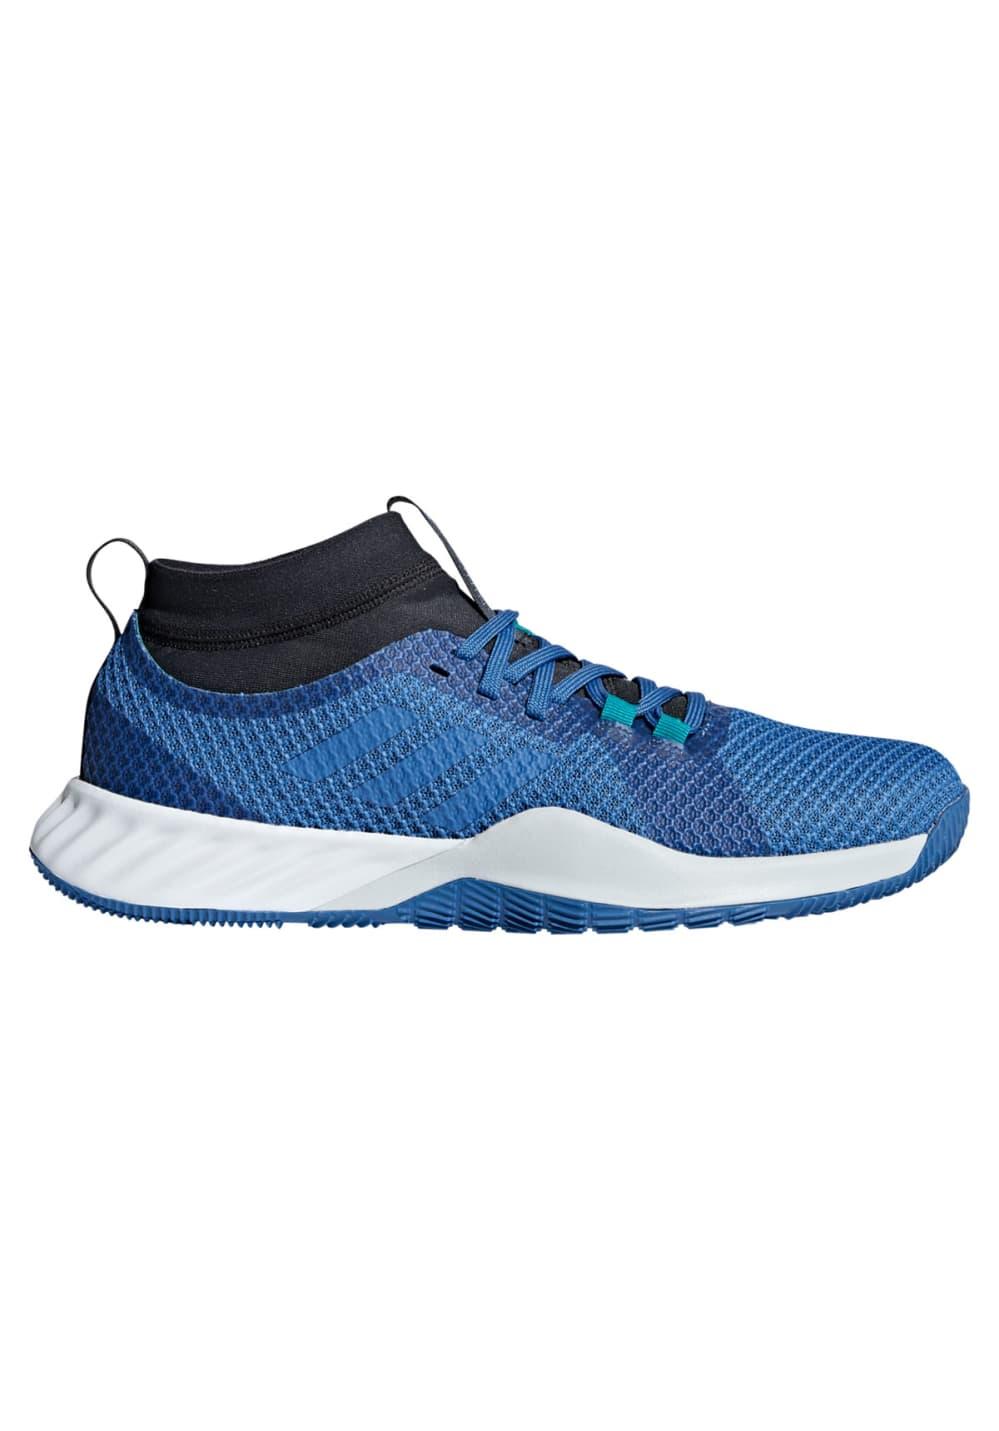 21b4d8f83 adidas CrazyTrain Pro 3.0 M - Fitness shoes for Men - Blue | 21RUN